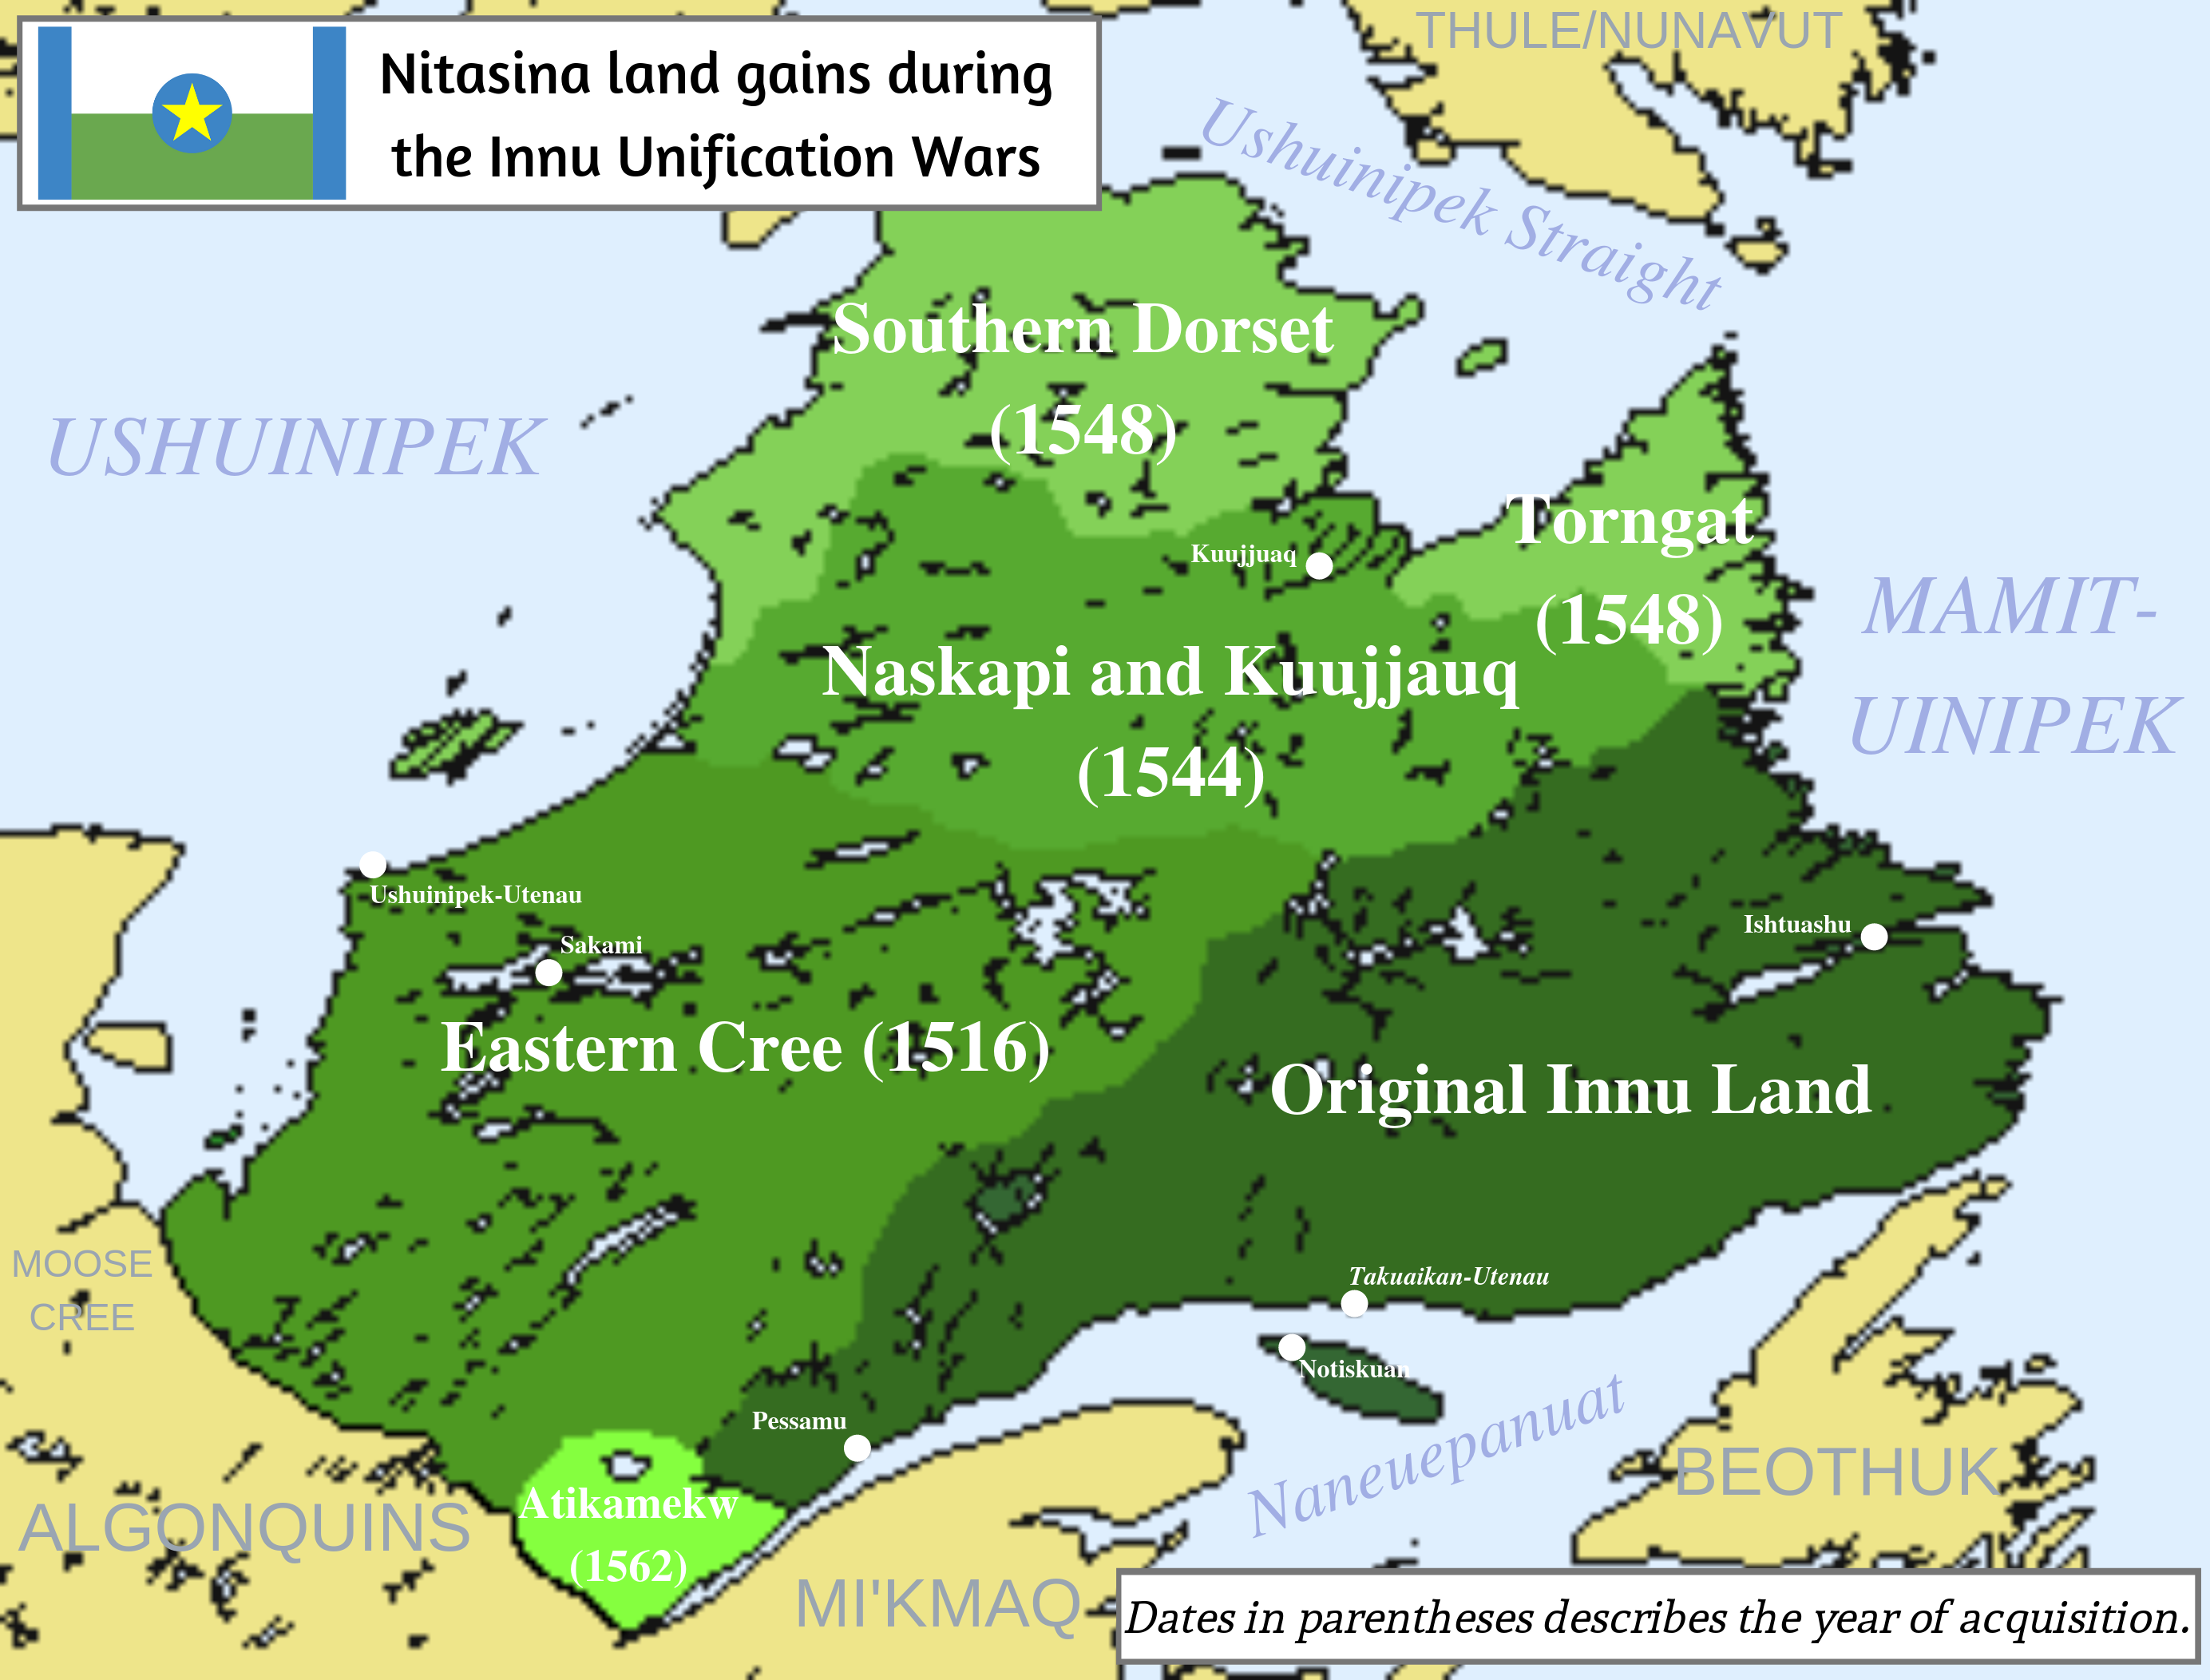 Innu Unification Wars (Mundus Novus Map Game)